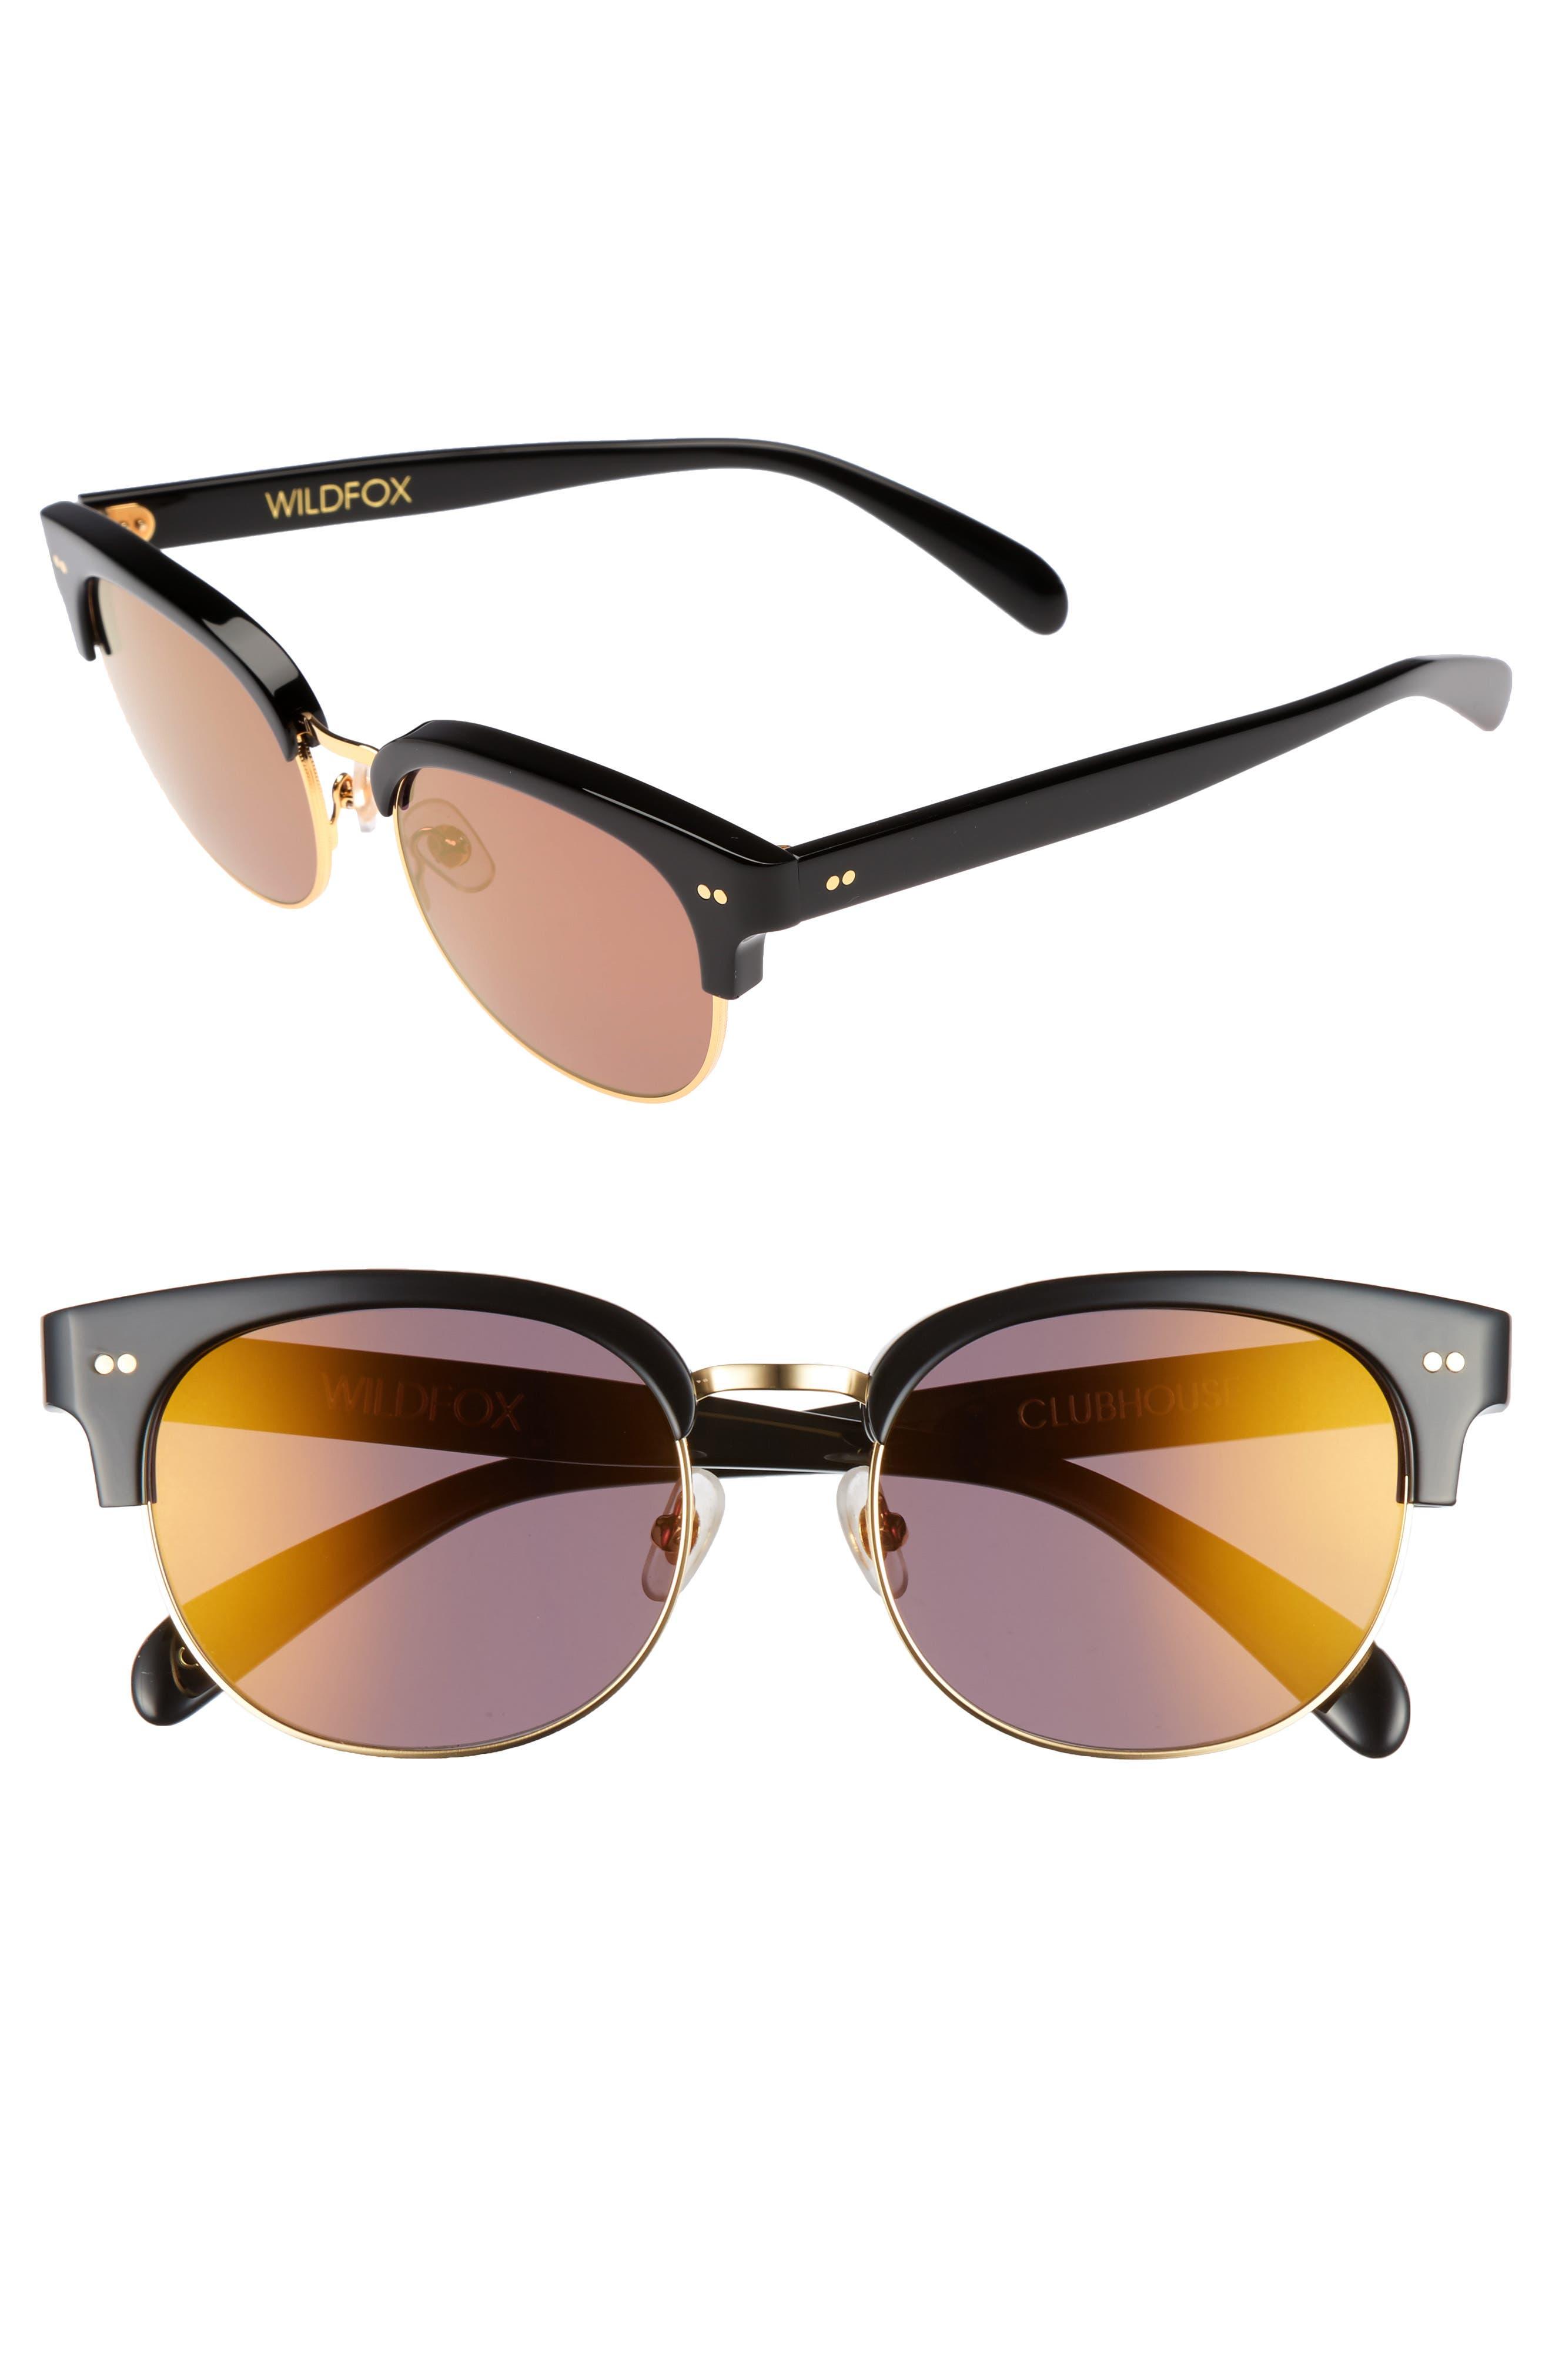 Clubhouse 50mm Semi-Rimless Sunglasses,                             Main thumbnail 1, color,                             Black/ Gold